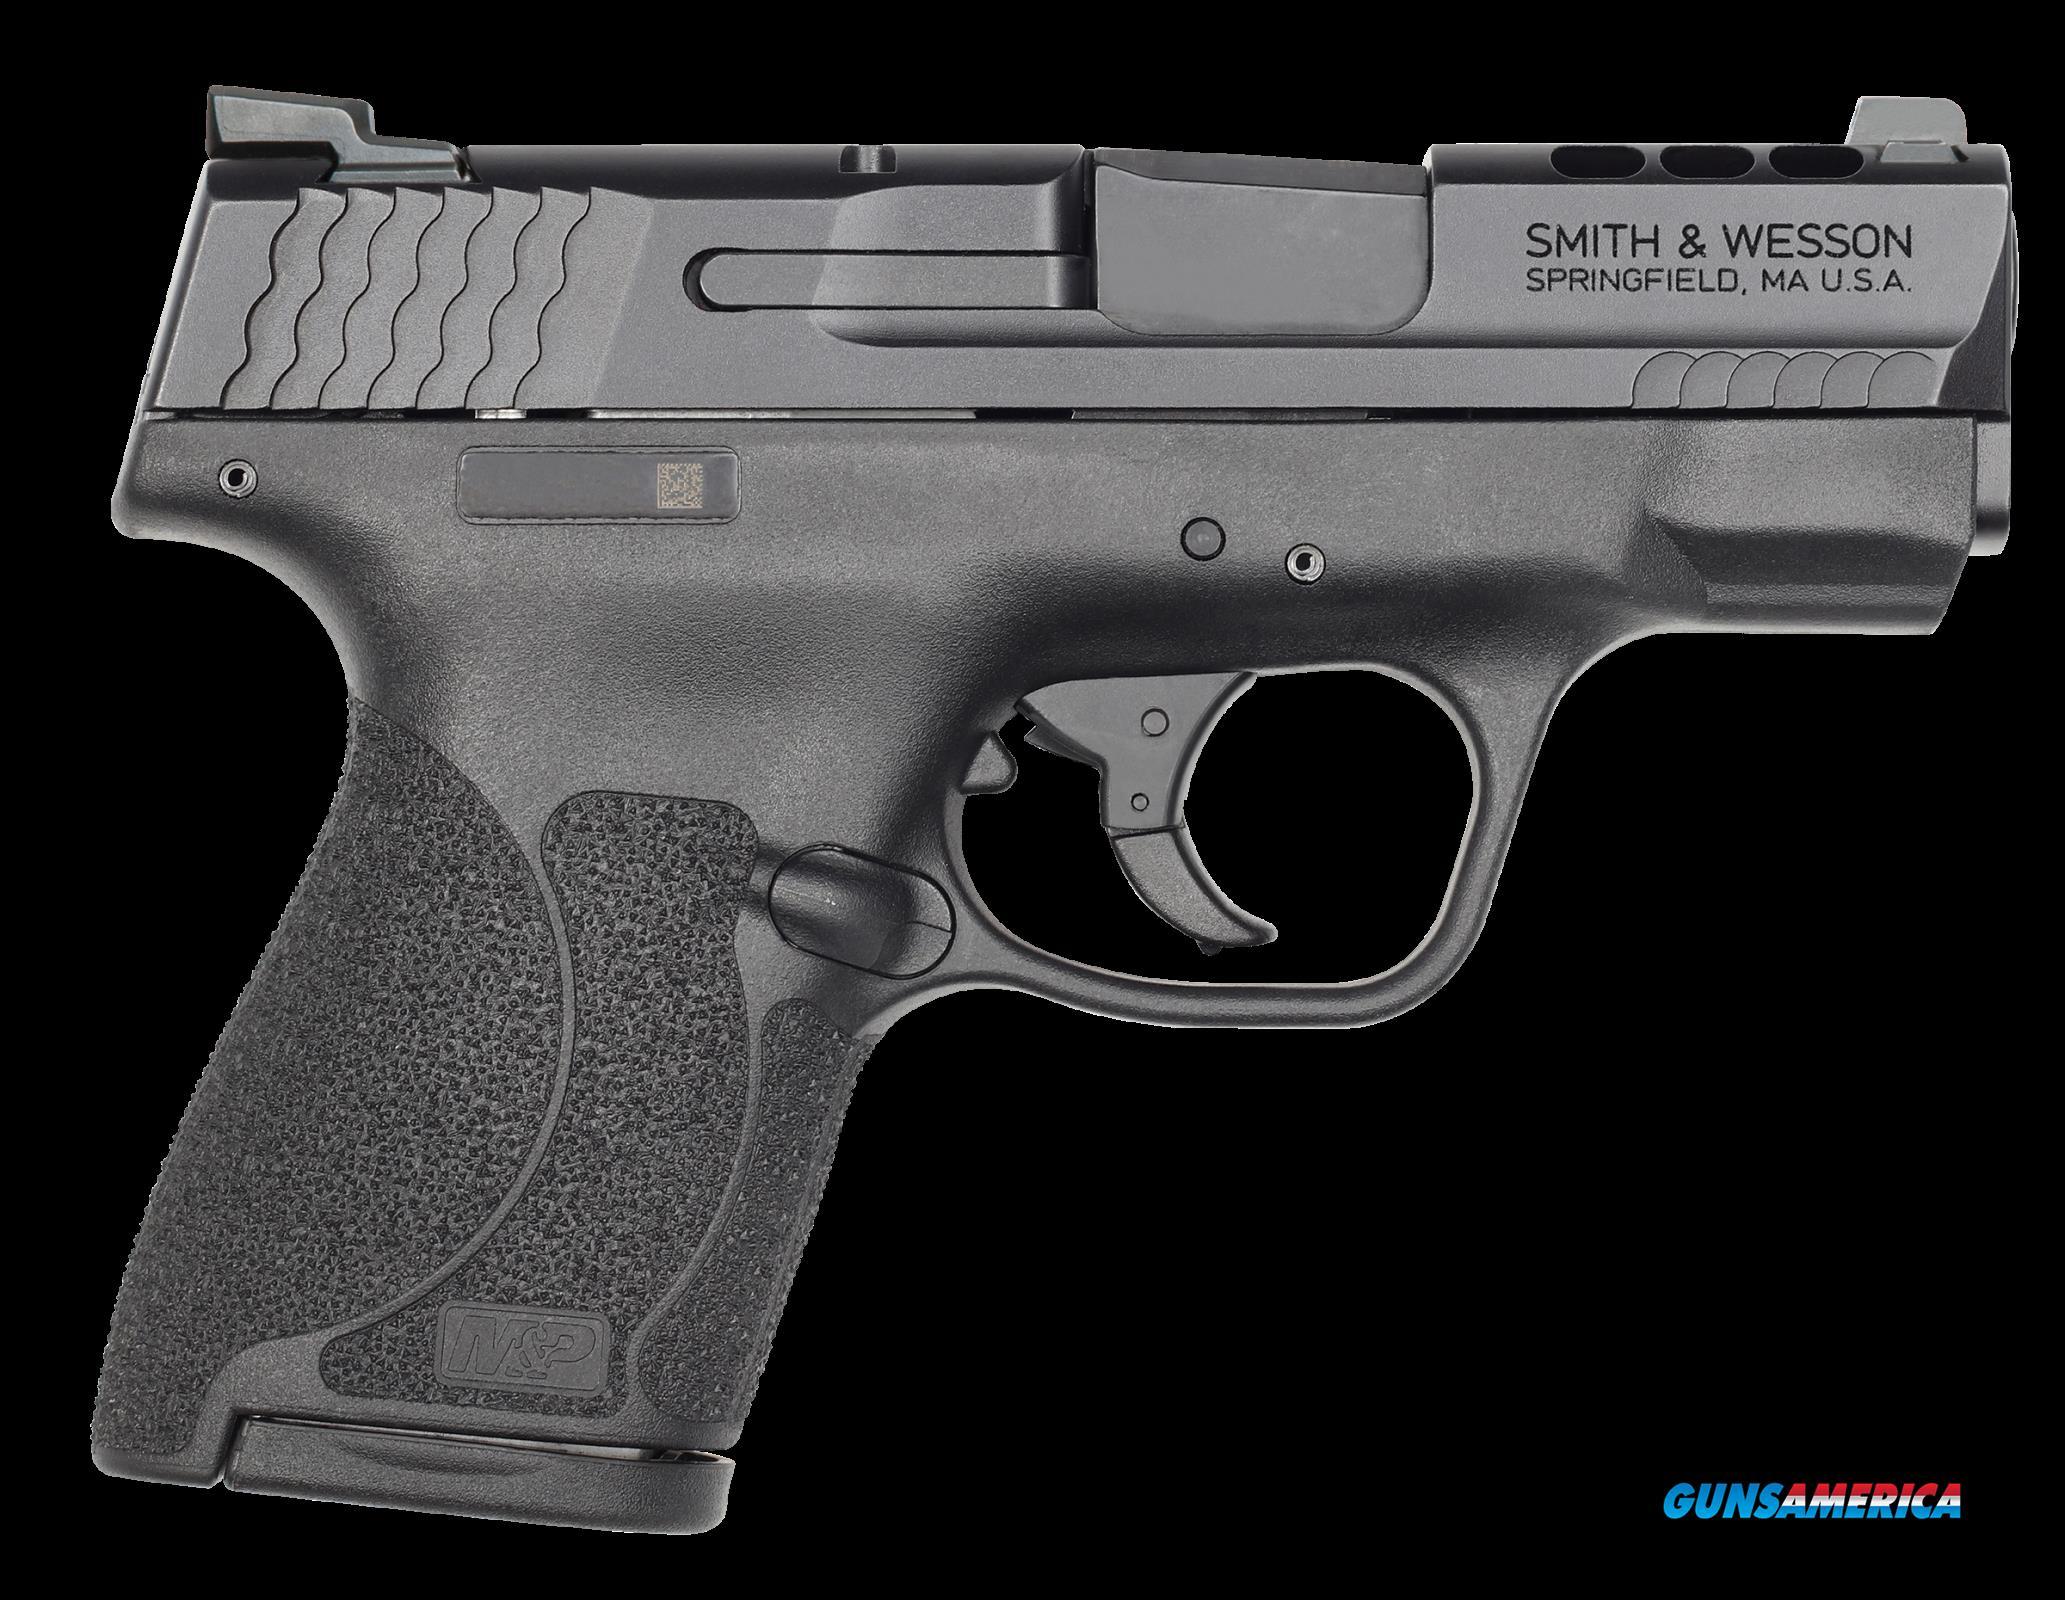 Smith & Wesson M&p 40, S&w M&p40shld  11870 Pfmc 40 3.1 Pt 2.0 Tri   Ts  Guns > Pistols > 1911 Pistol Copies (non-Colt)